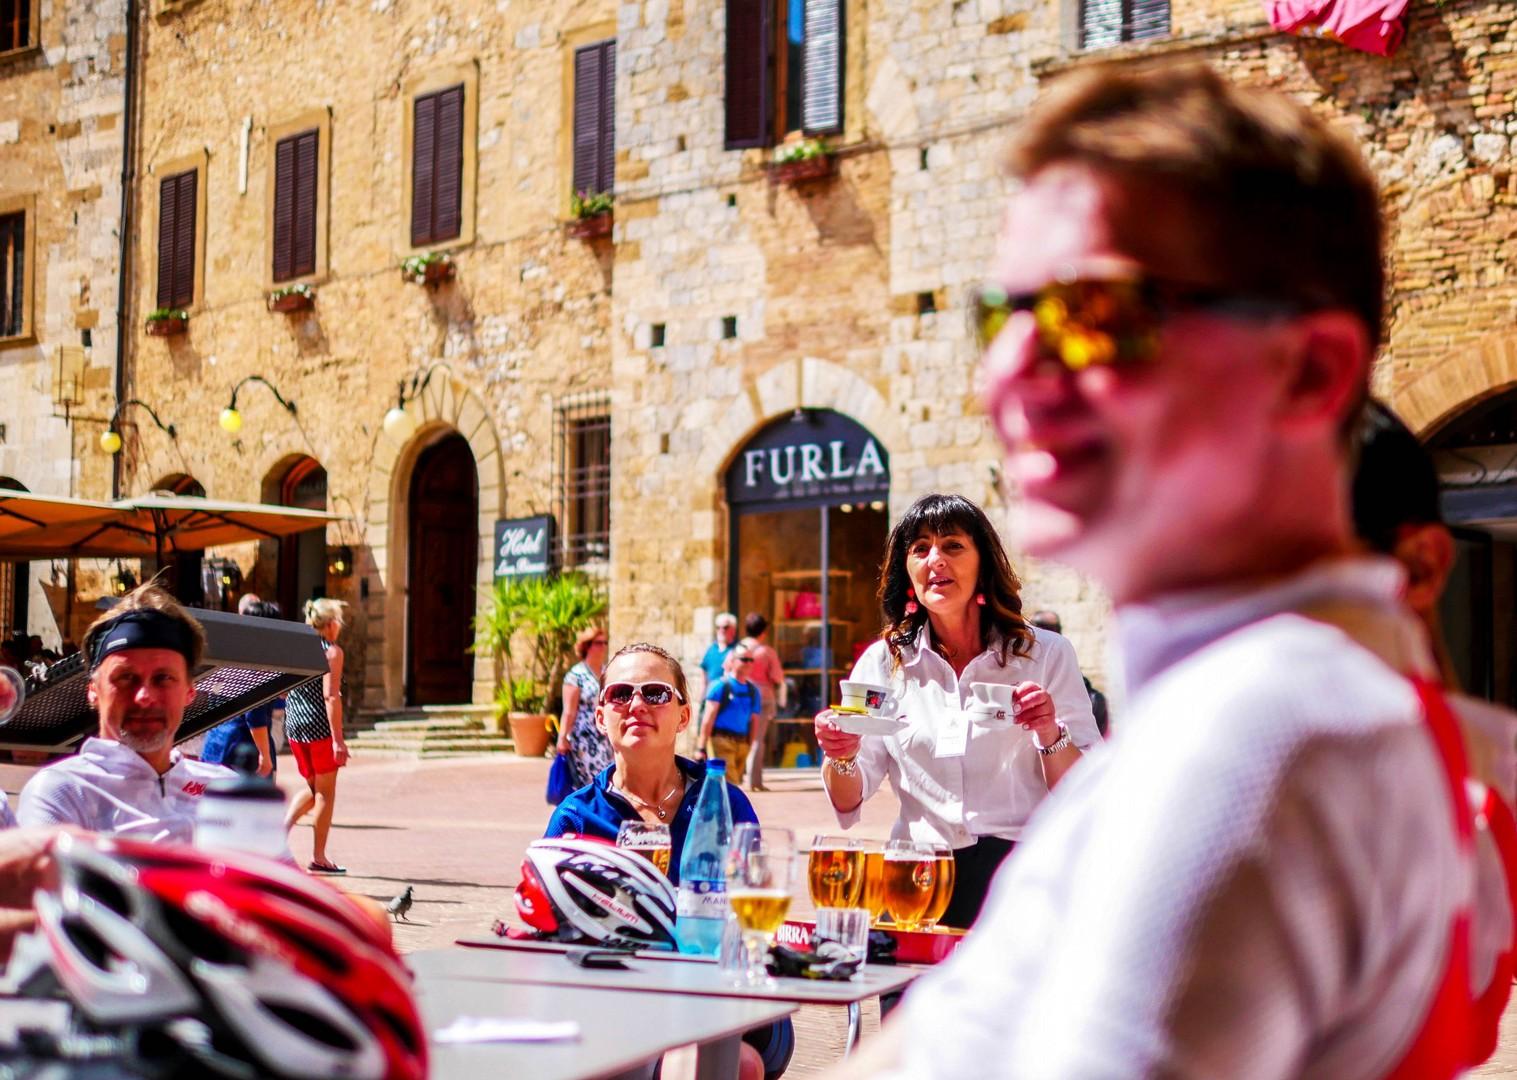 Beer or coffee.jpg - Italy - Tuscany - Giro della Toscana - Guided Road Cycling Holiday - Road Cycling